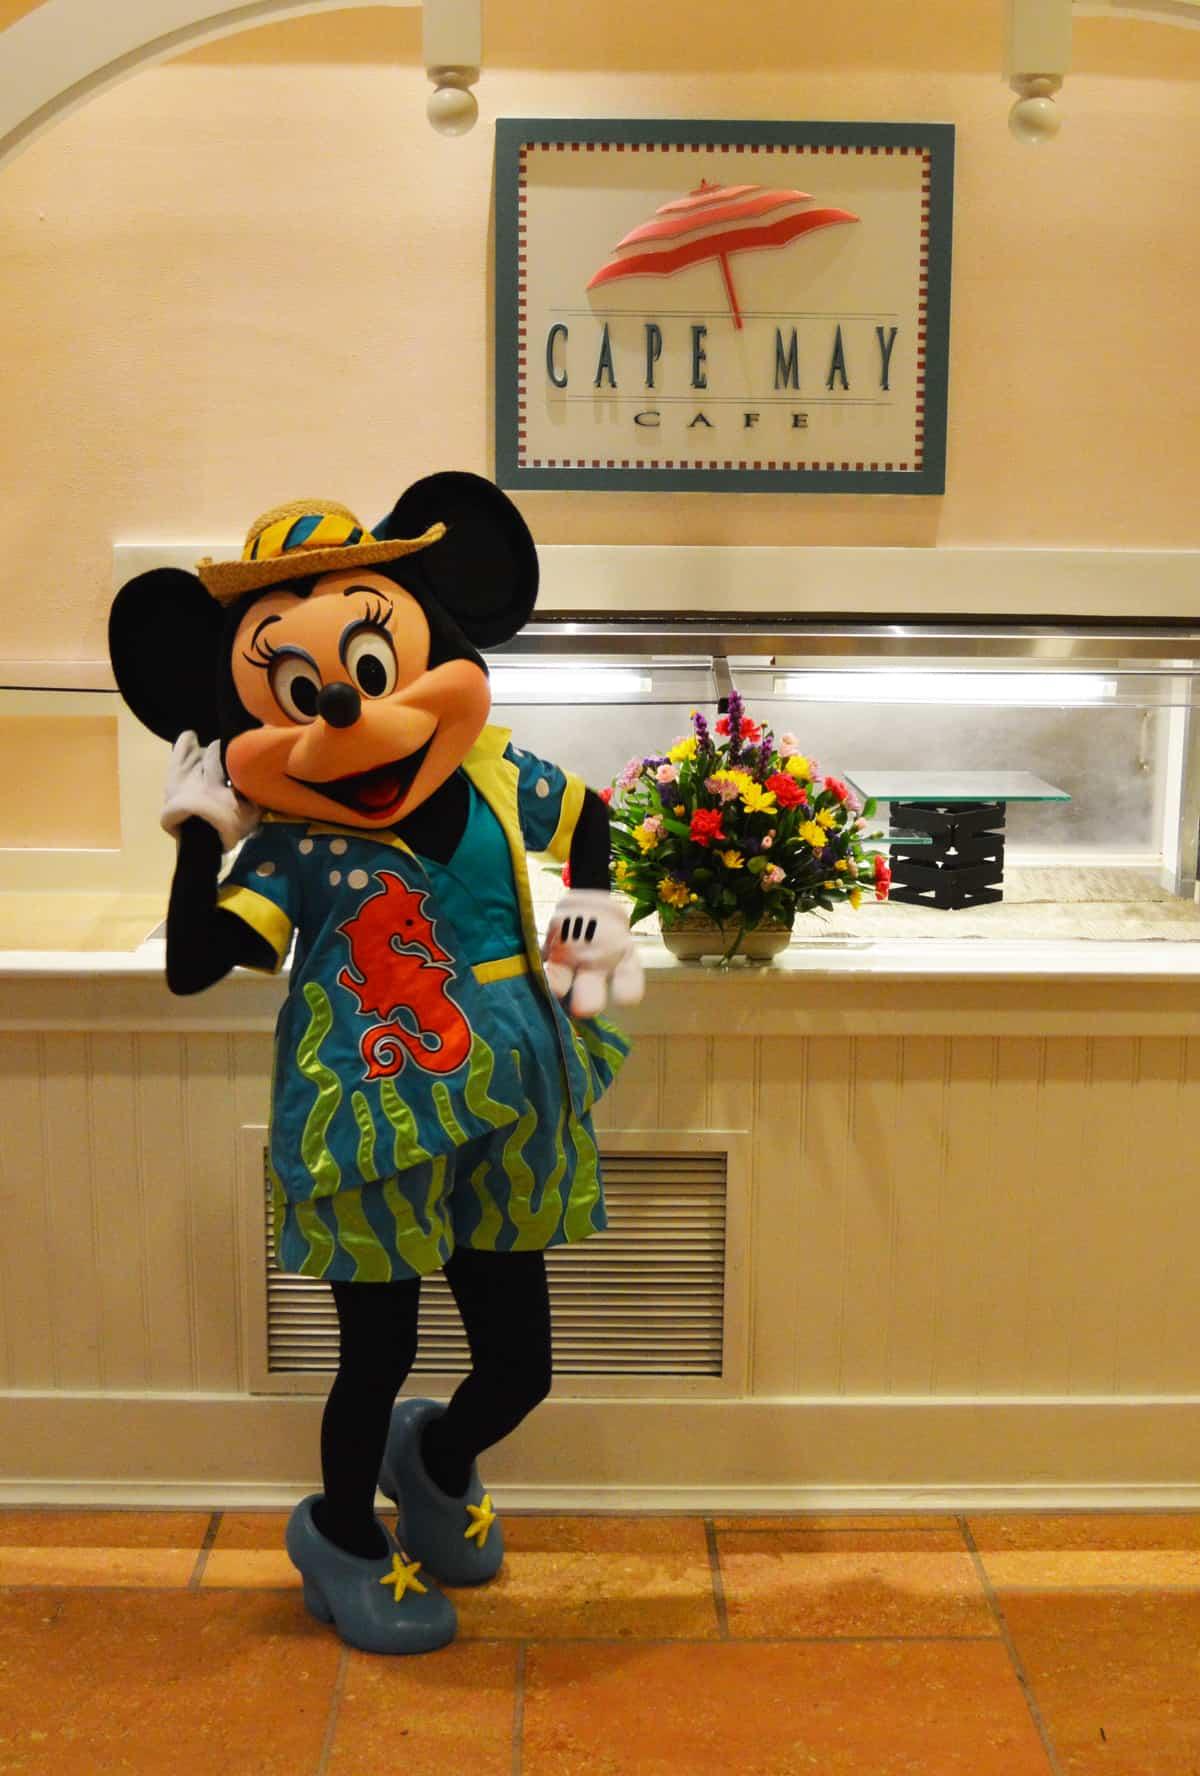 Disney World Dining Options